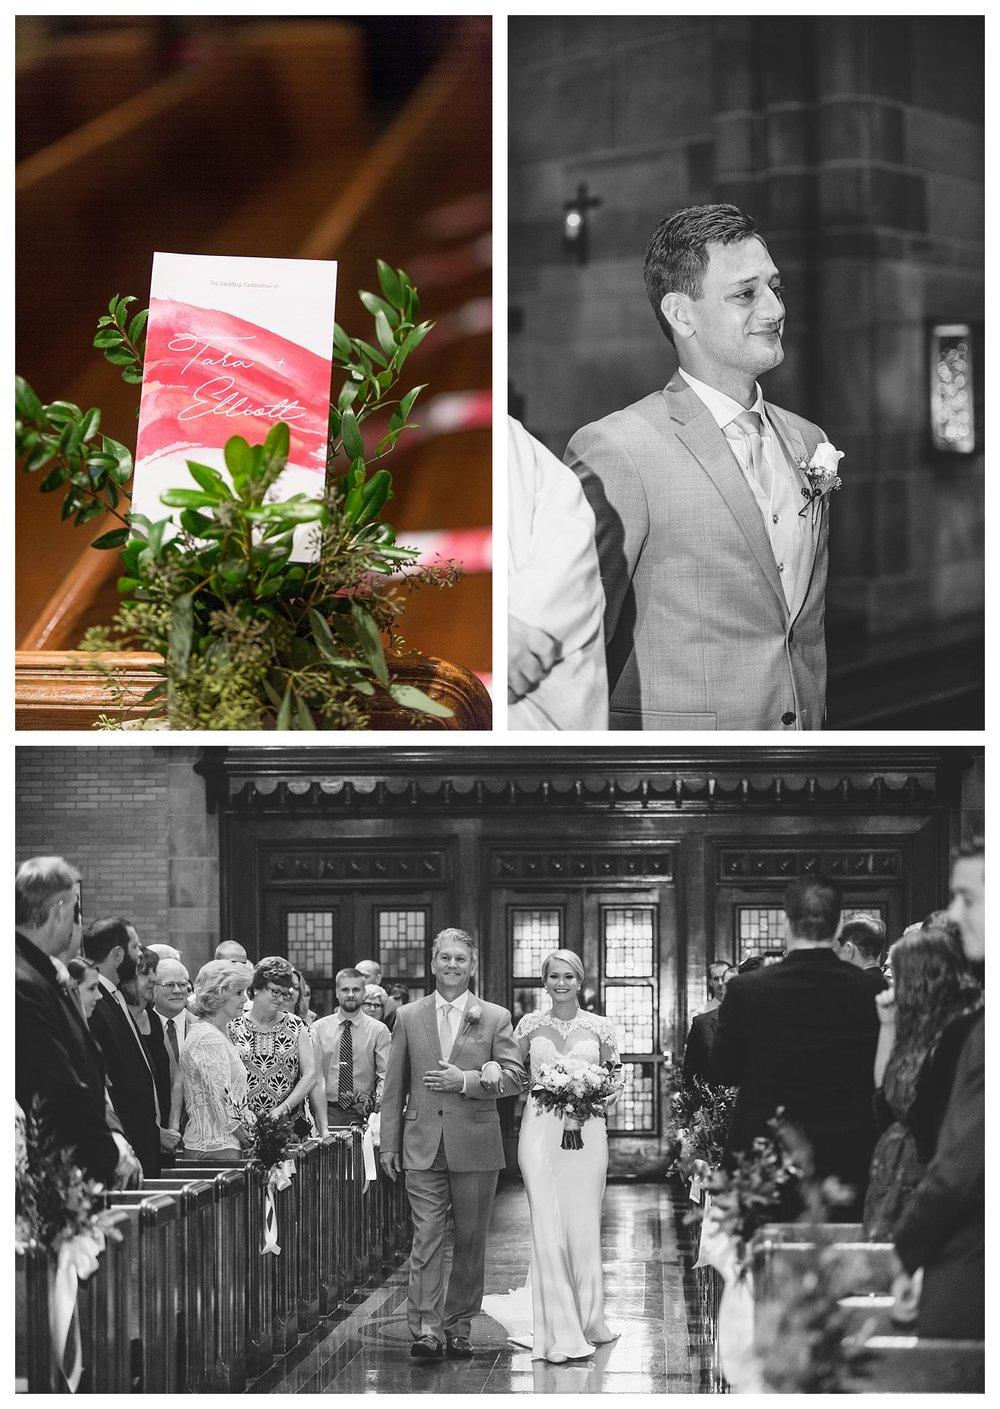 everleigh-photography-monastery-event-center-cincinnati-wedding-photographer-tara-and-elliot-heil-wedding-39